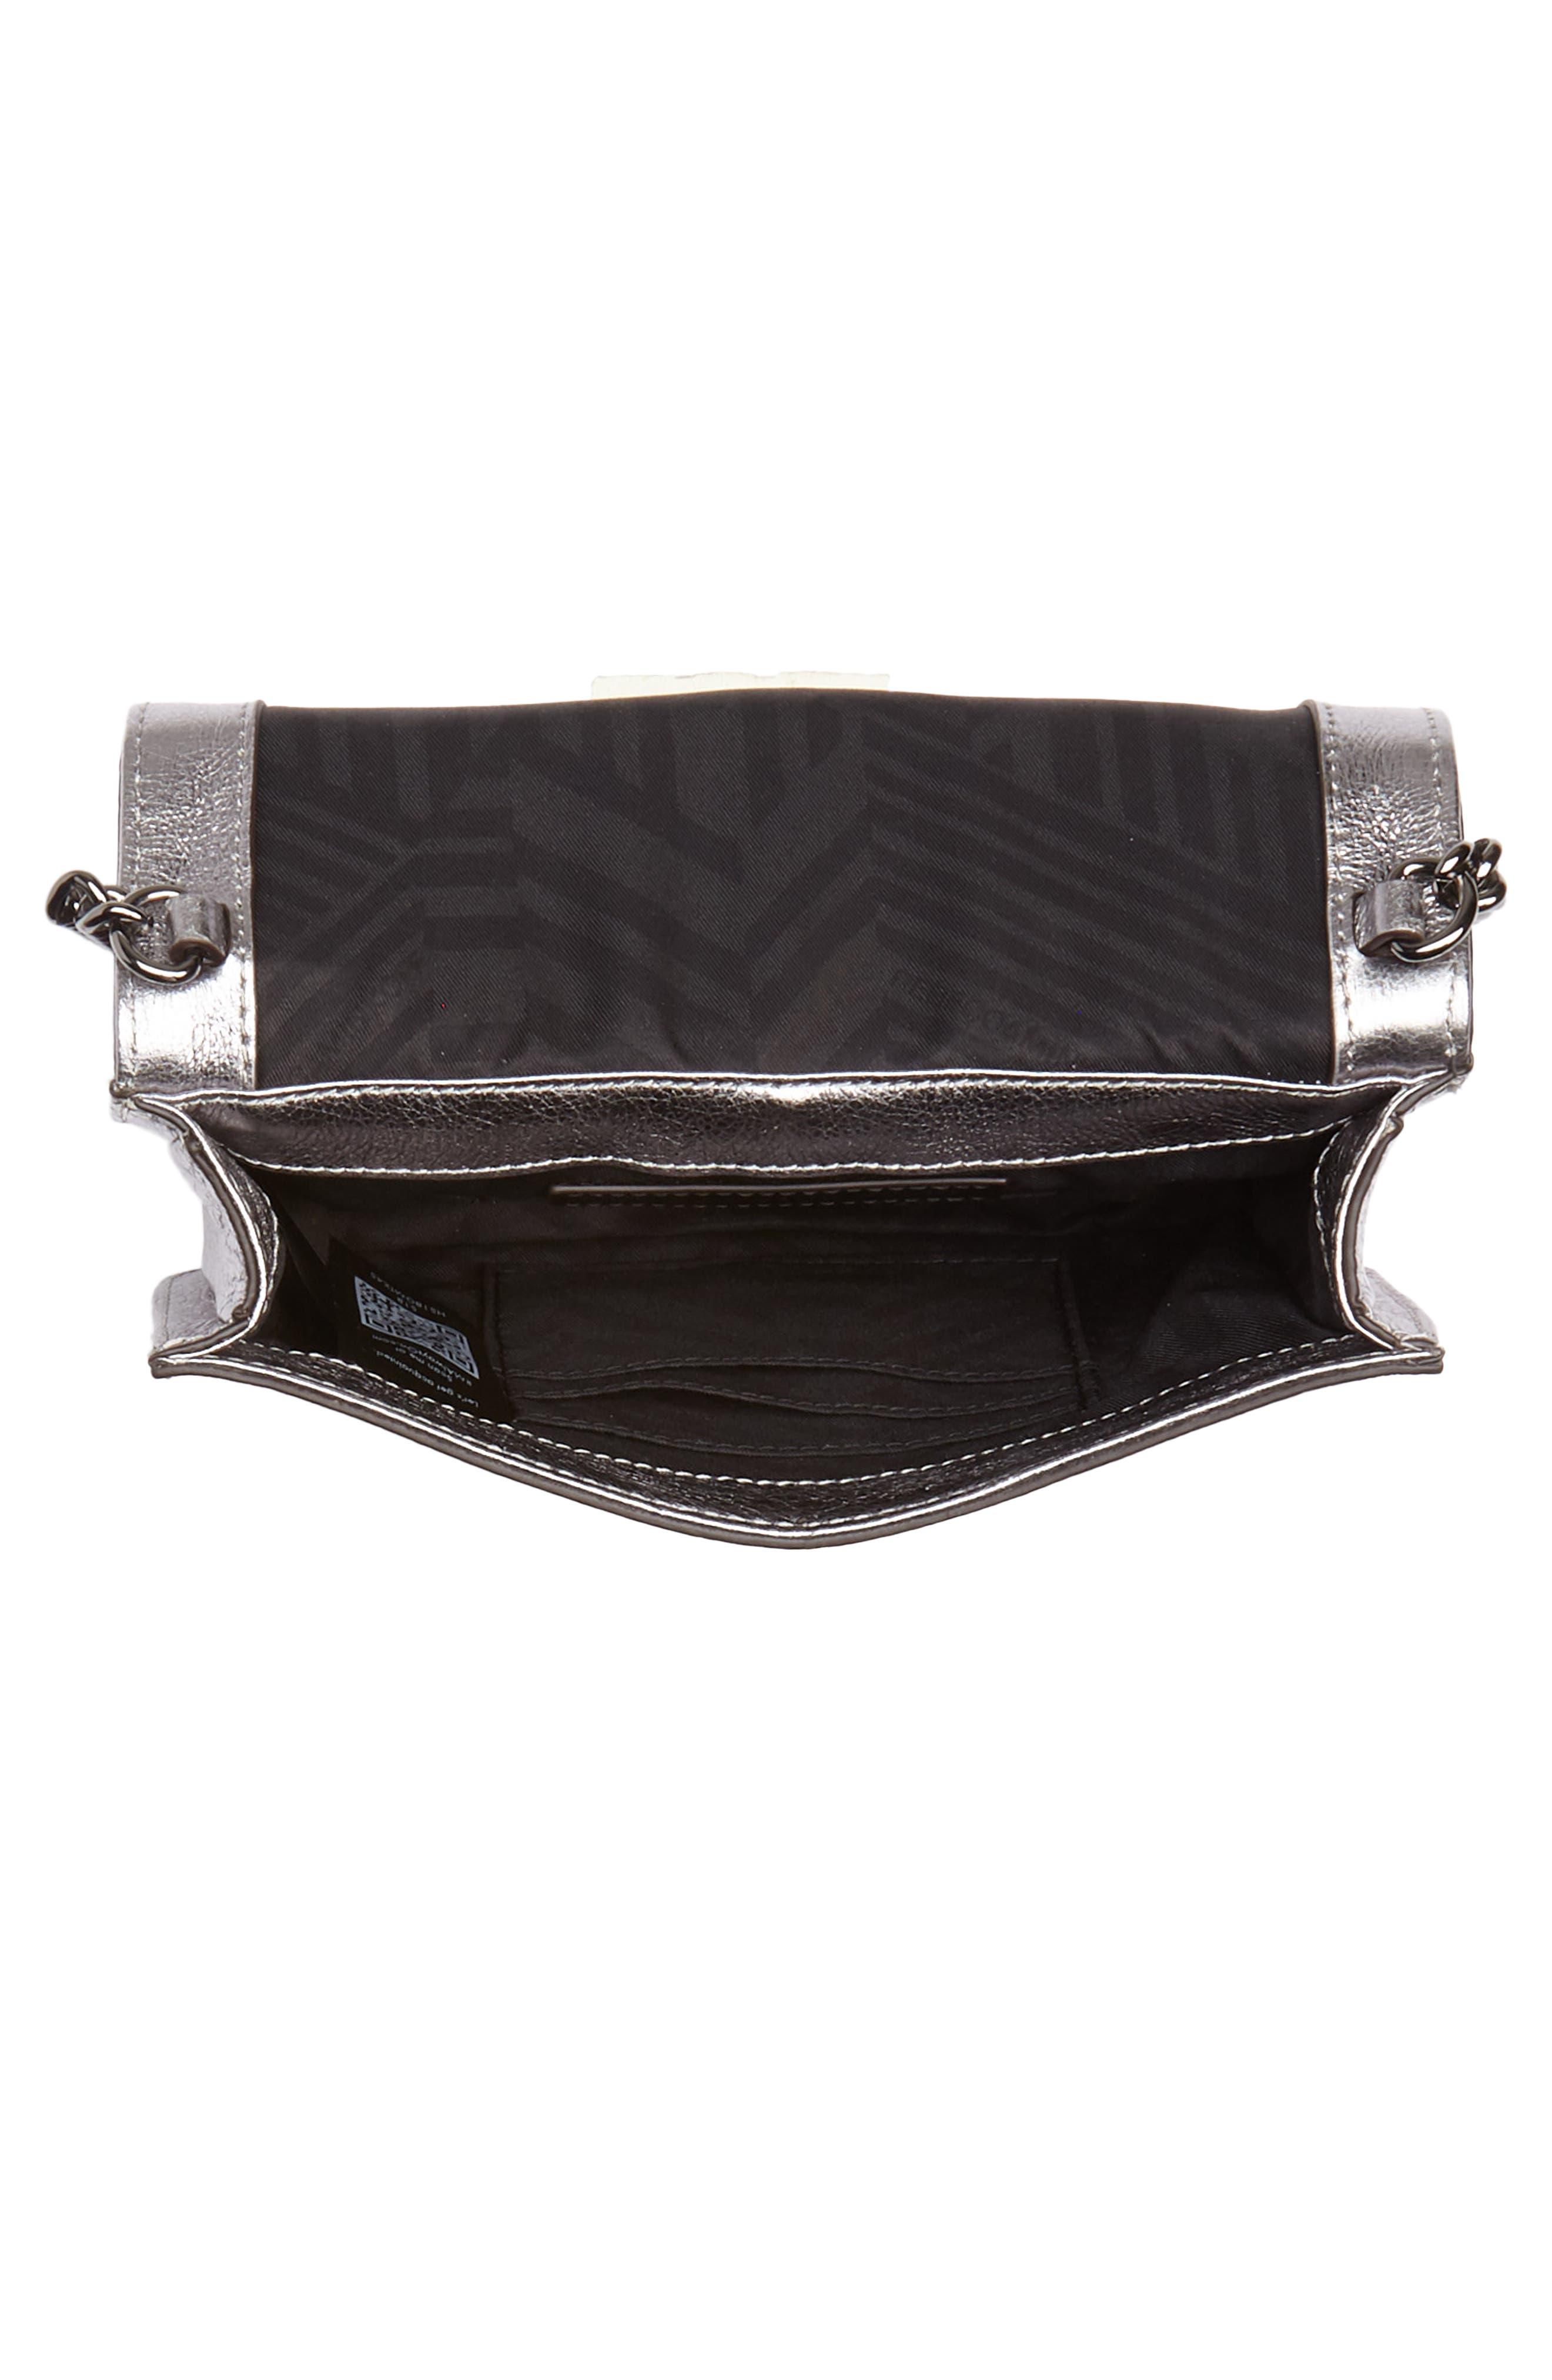 Small Love Metallic Leather Crossbody Bag,                             Alternate thumbnail 10, color,